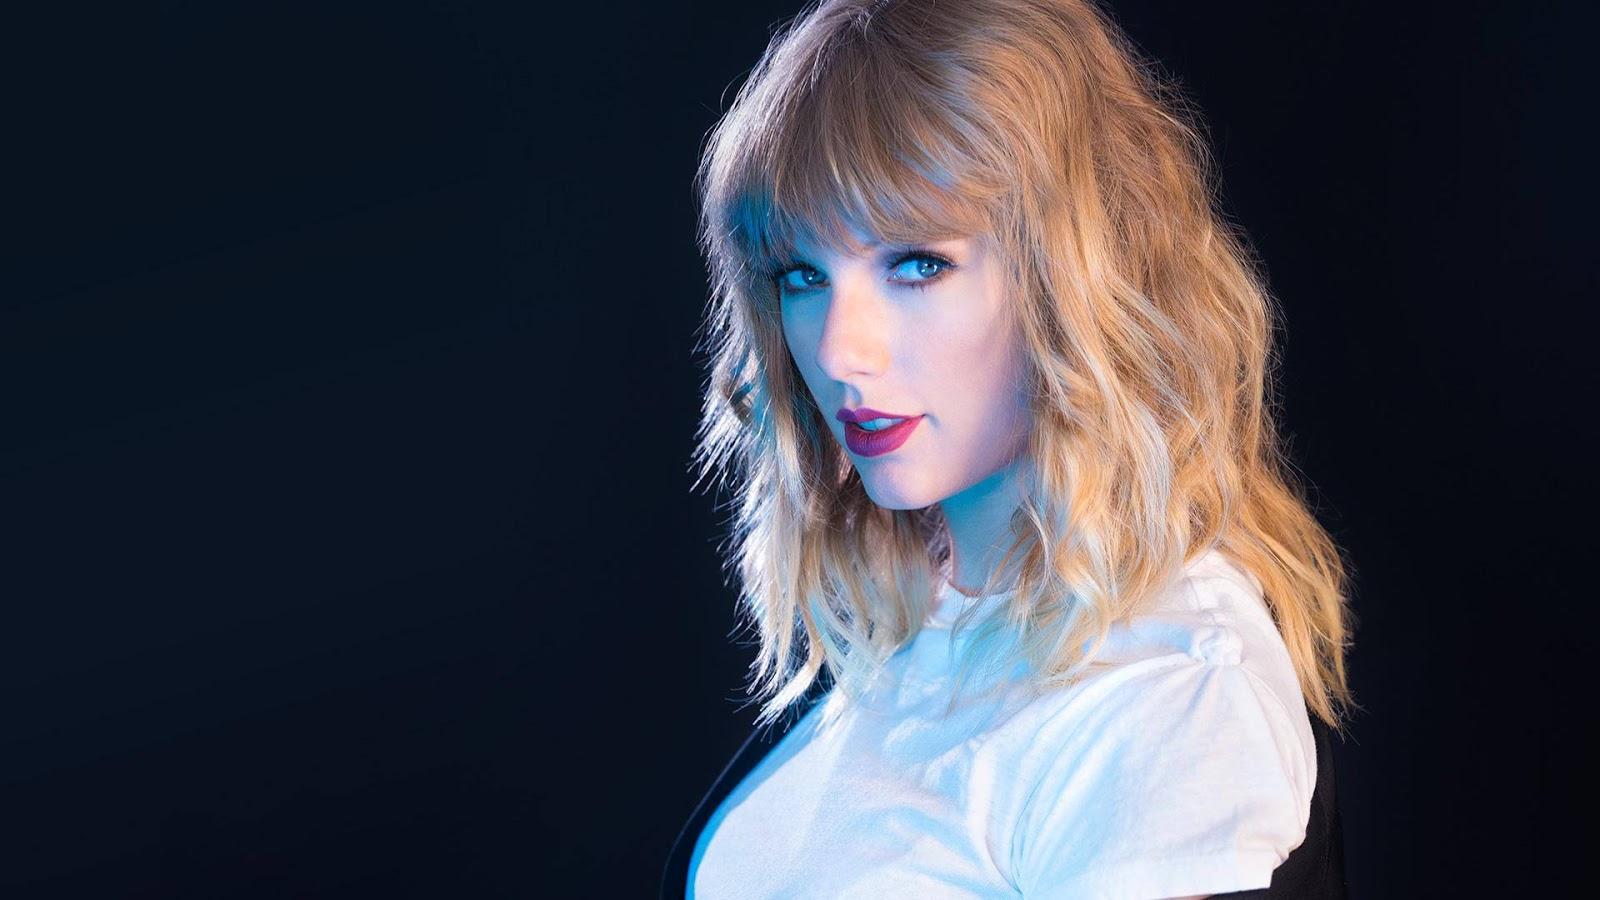 Lady Nerdy...Taylor Swift 泰勒絲歌詞中文翻譯: Taylor Swift - Dress 中文翻譯歌詞